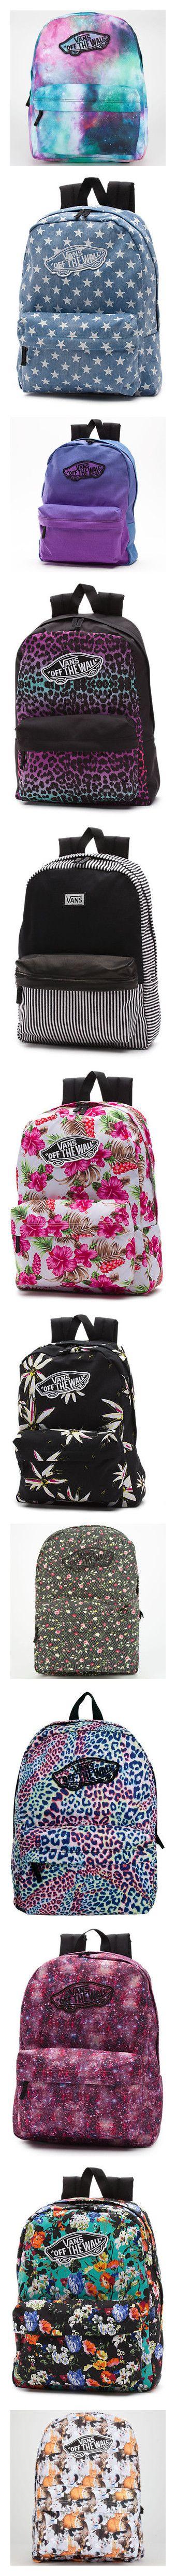 """Vans BACKpack"" by beingmyselfaf ❤ liked on Polyvore featuring vans, backpack, bags, backpacks, zipper bag, blue bag, blue tie dye backpack, shoulder strap backpack, vans backpack and accessories"